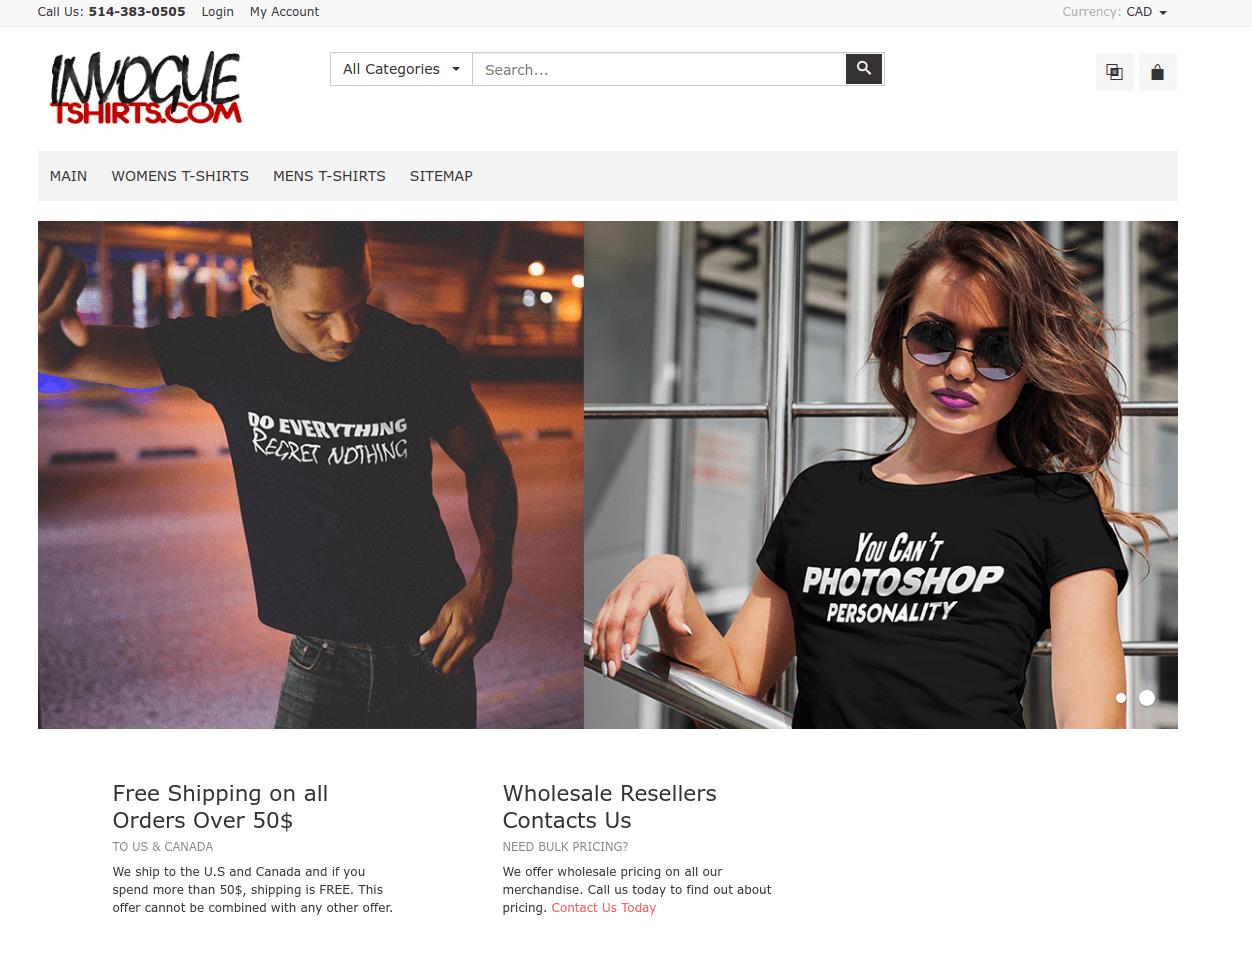 Invoguetshirts.com